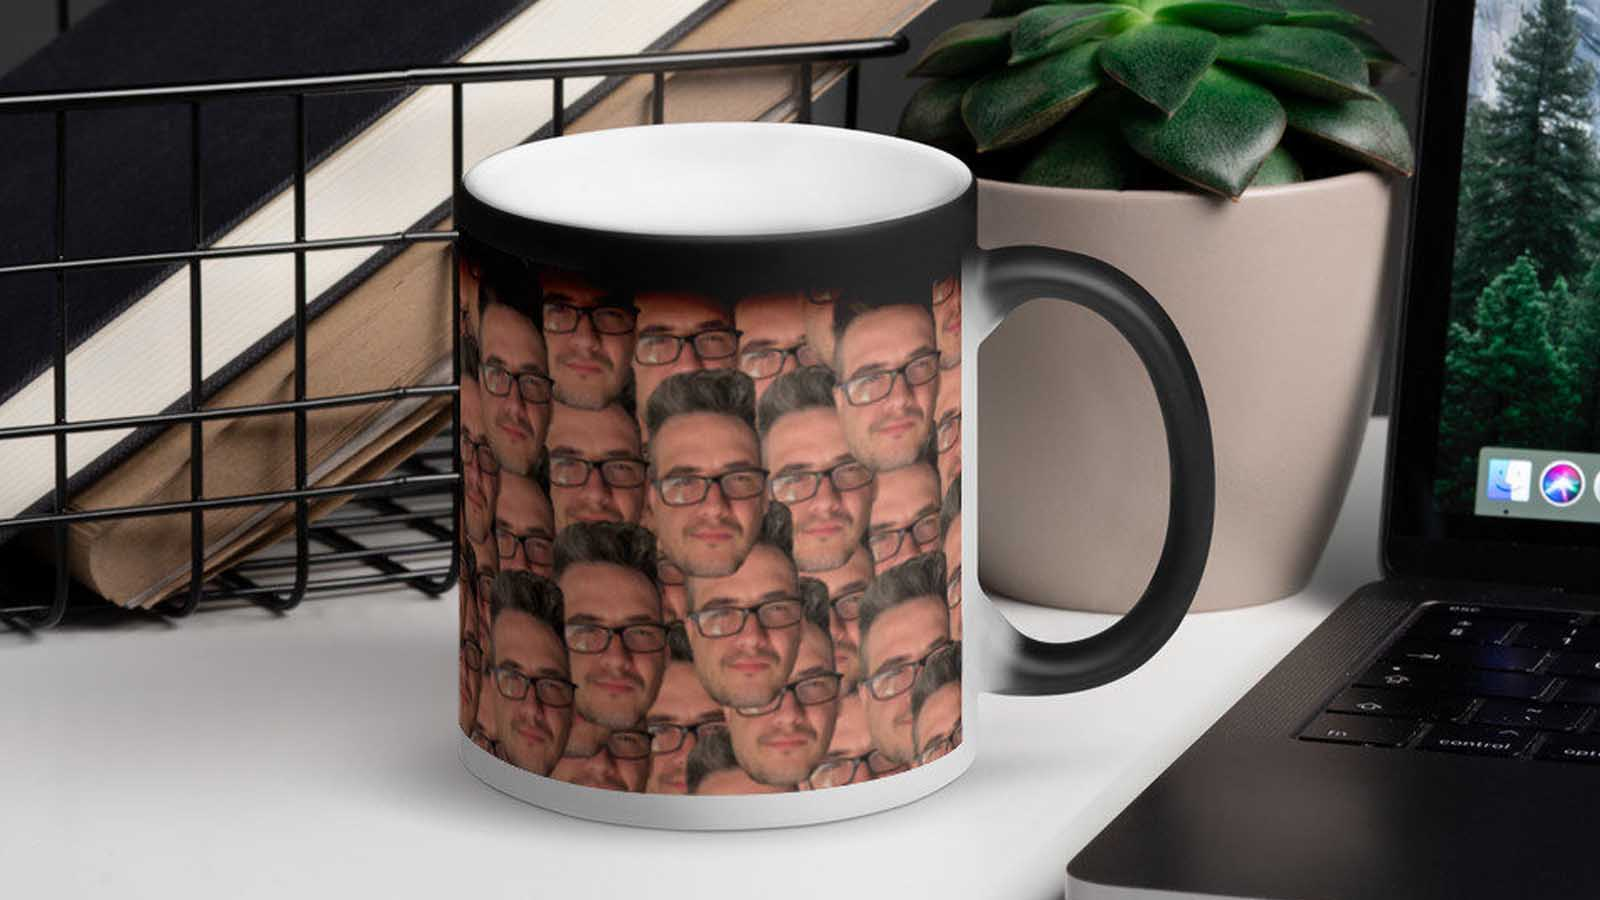 kafo mugs face coffee mug